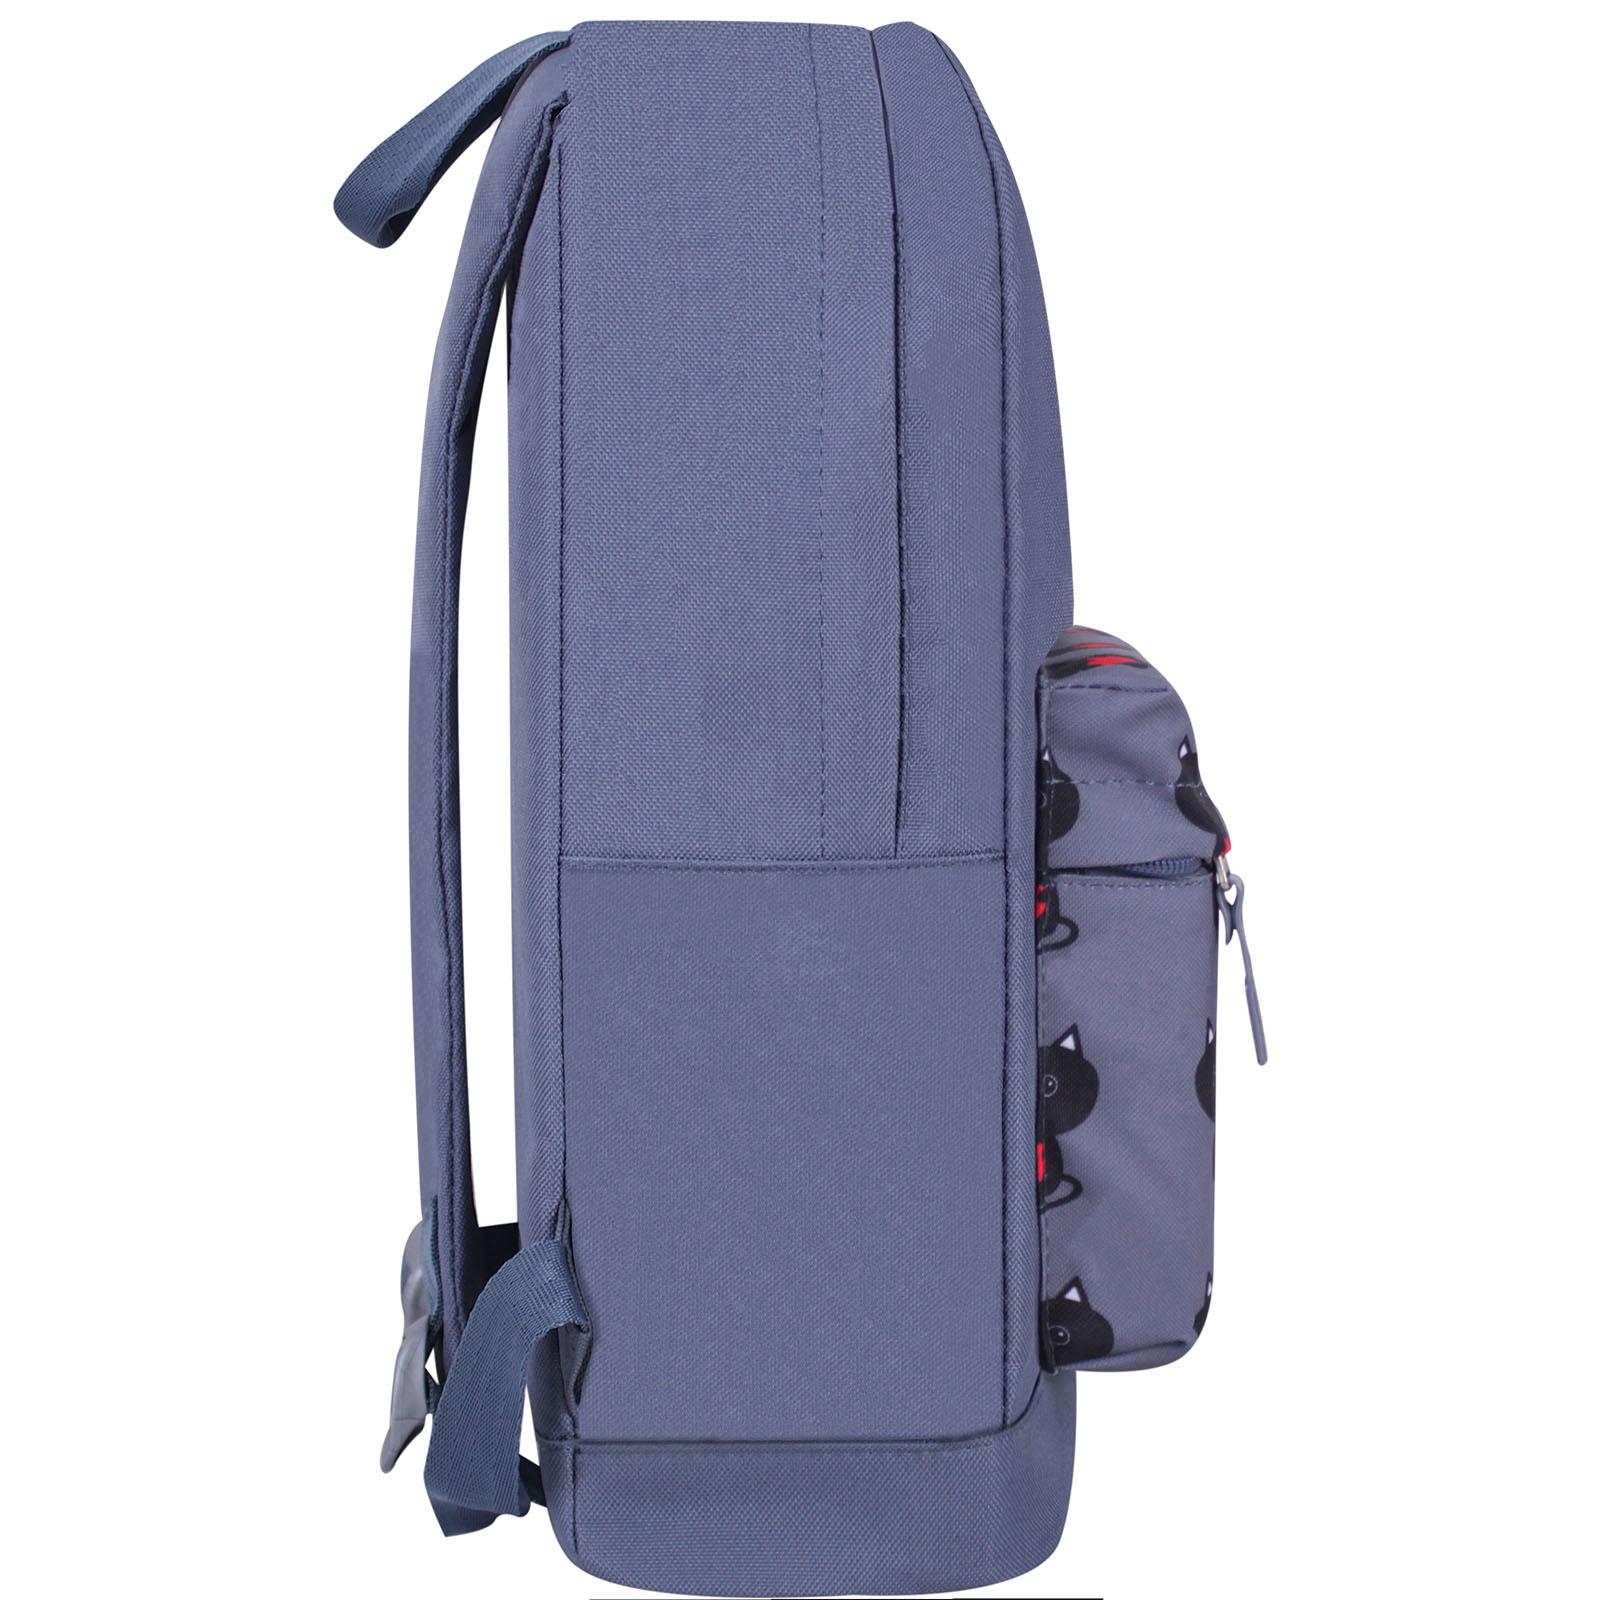 Рюкзак Bagland Молодежный W/R 17 л. Серый 750 (00533662) фото 2